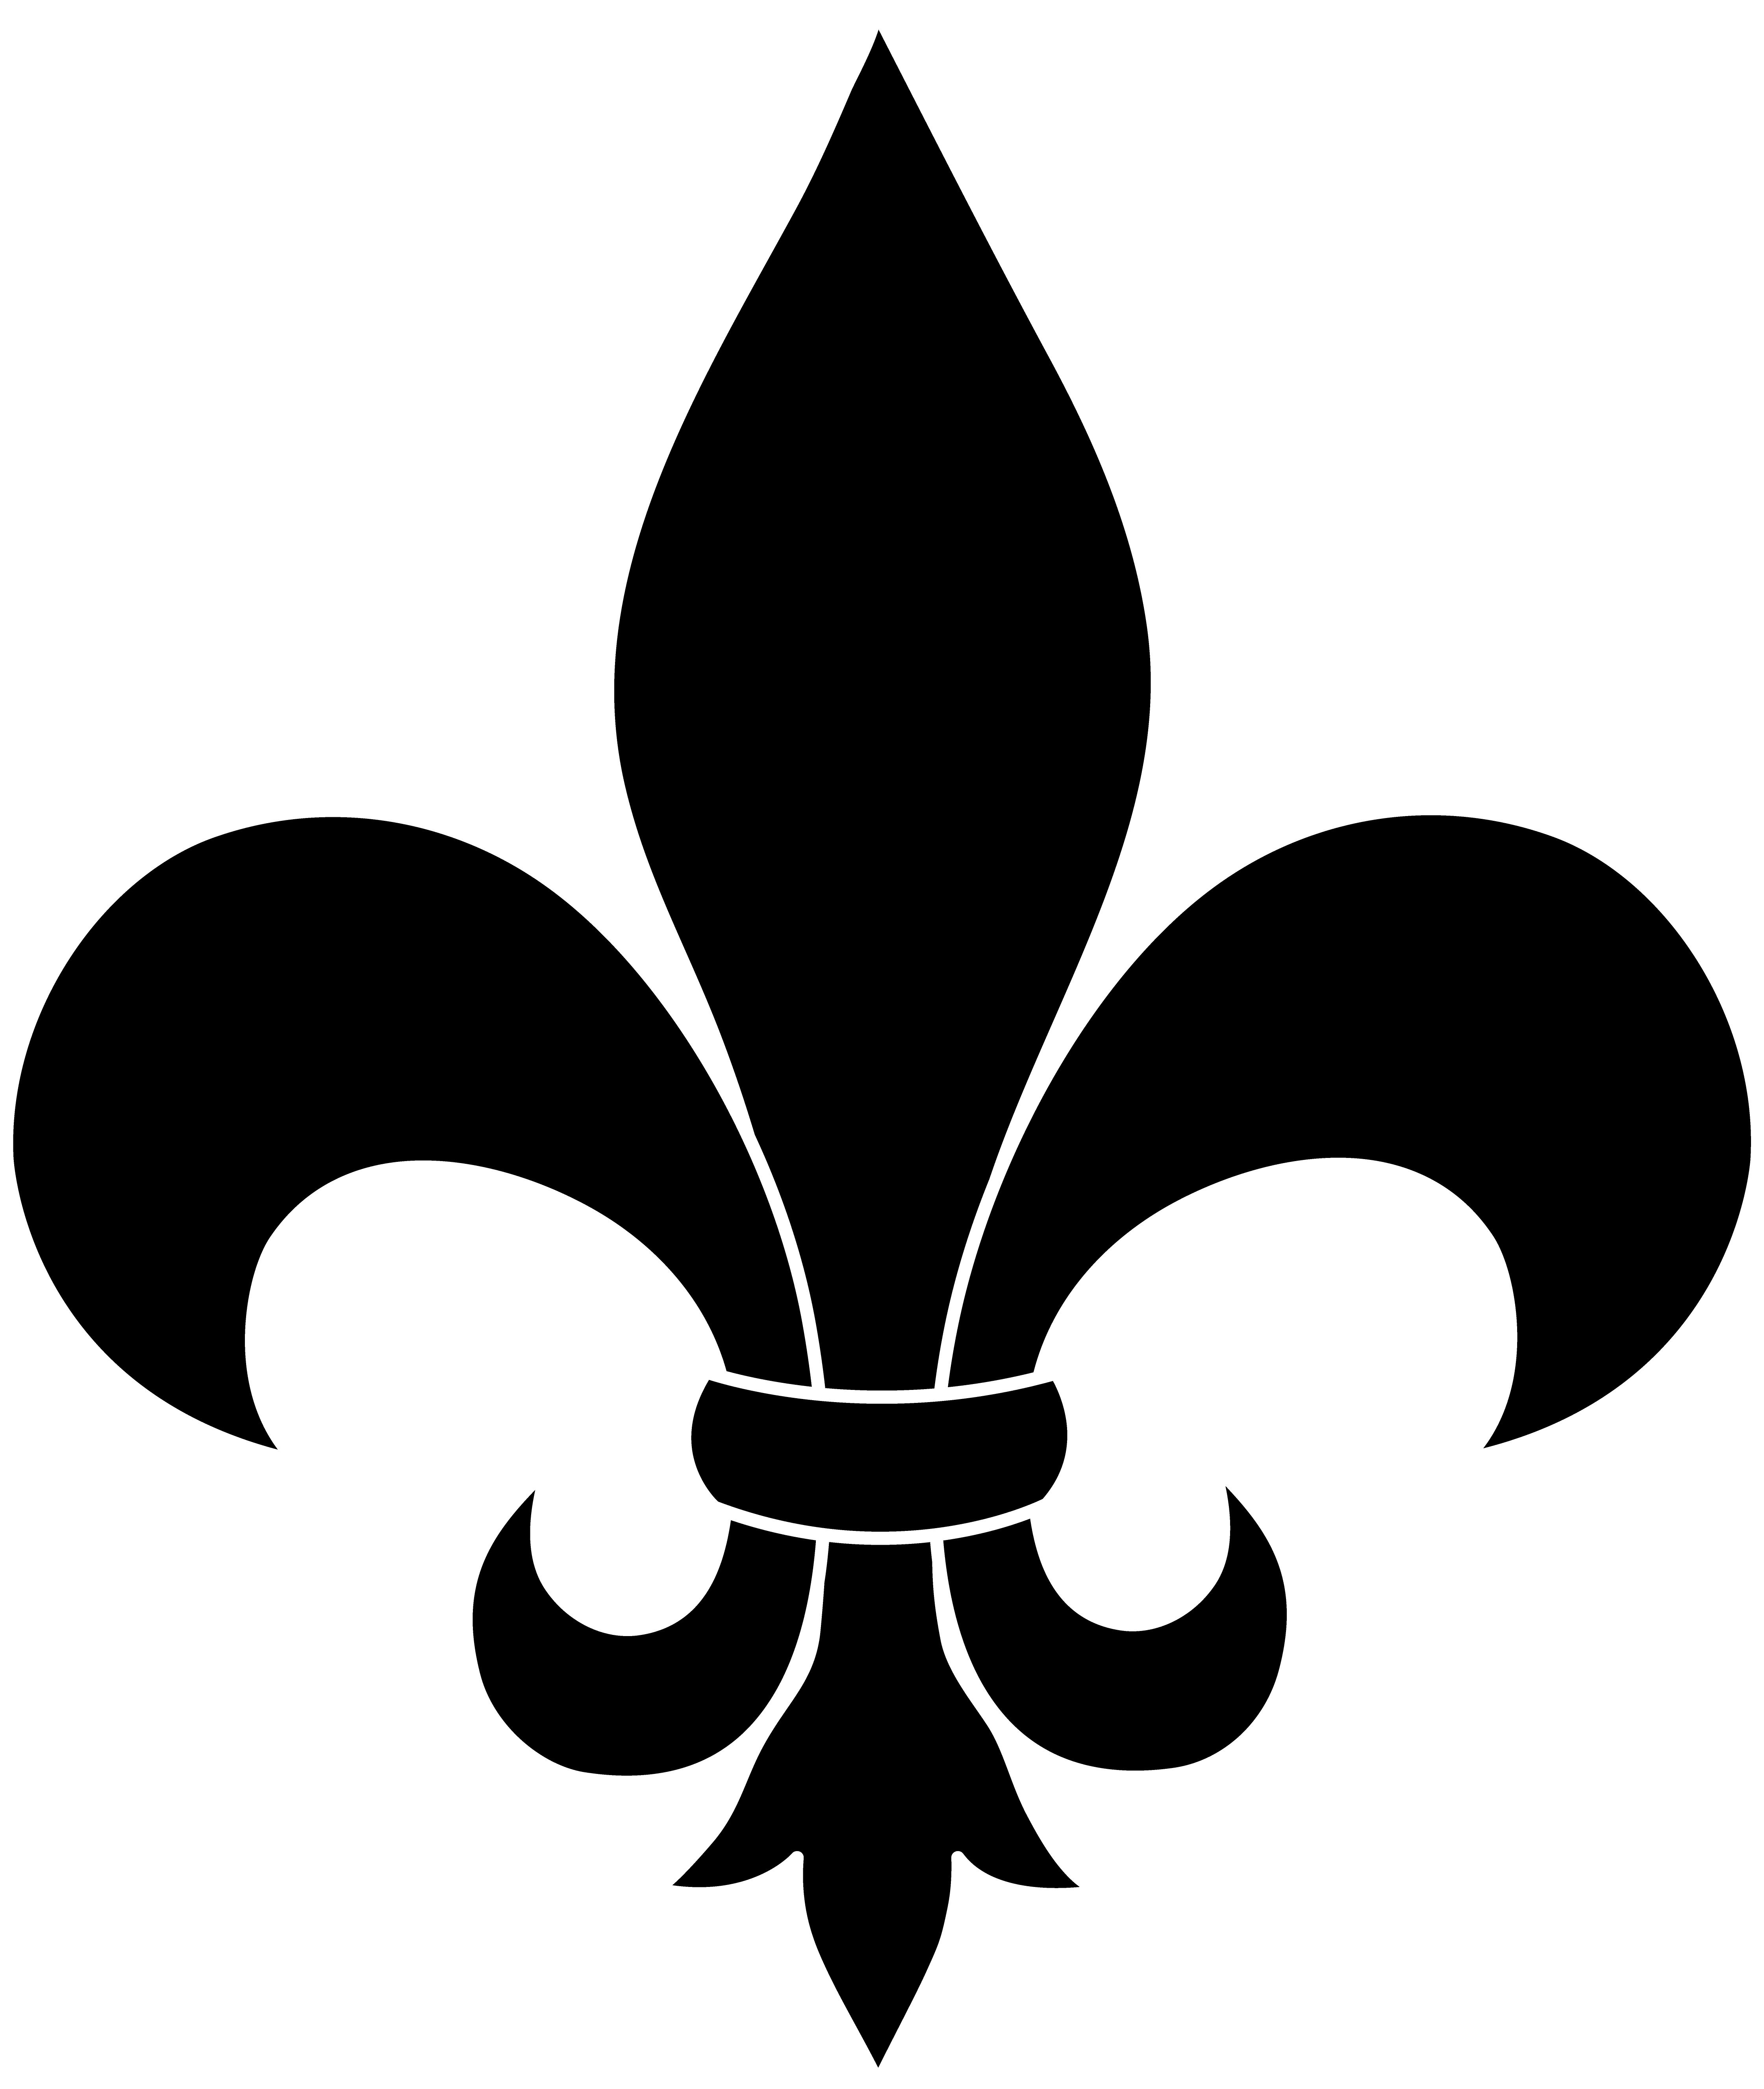 frrench free clip art black fleur de lis silhouette for flyer graphics pinterest clip. Black Bedroom Furniture Sets. Home Design Ideas